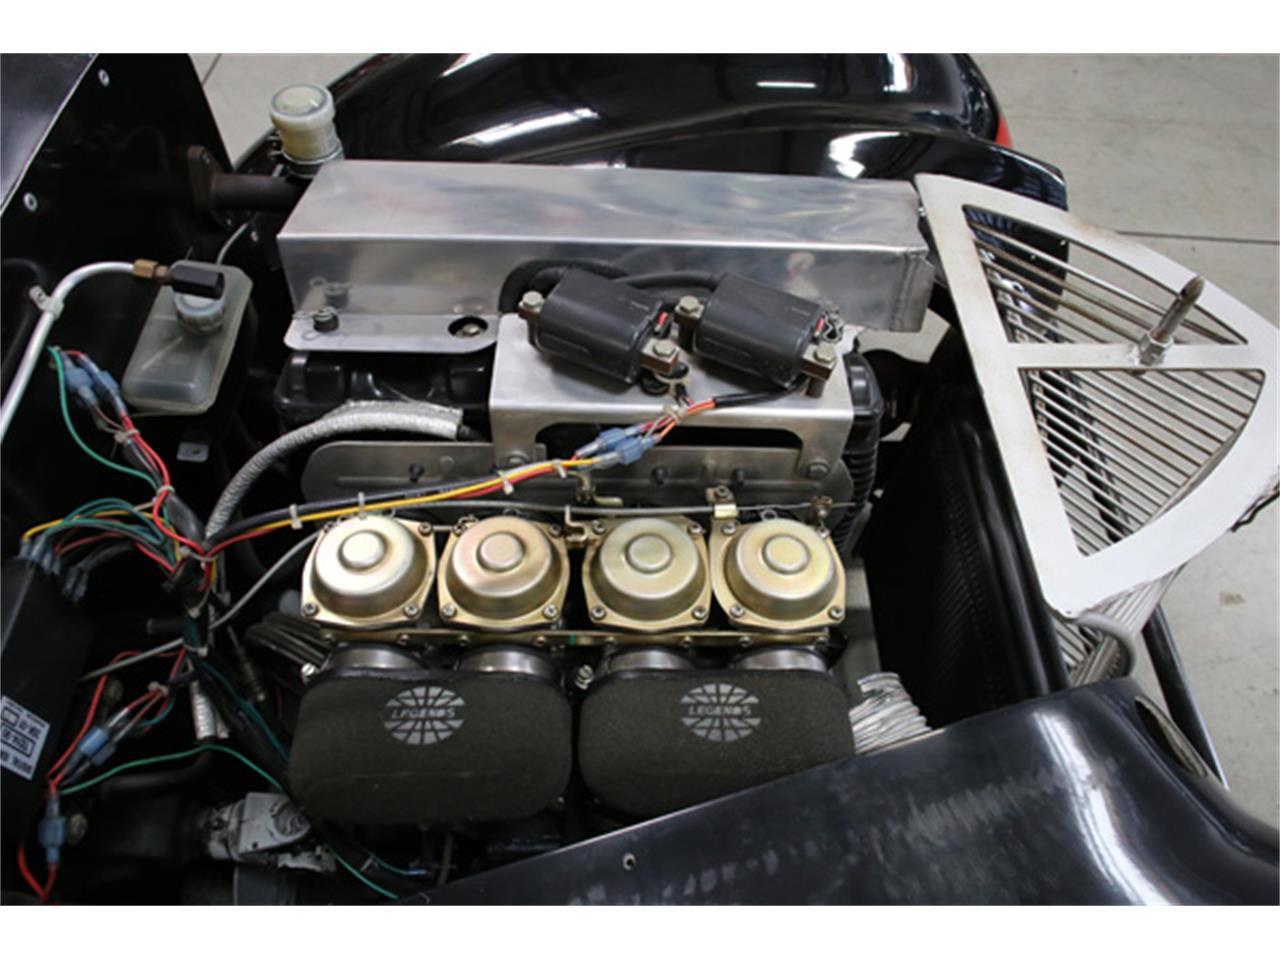 hight resolution of 600 legend race car wiring advance wiring diagram 600 legend race car wiring